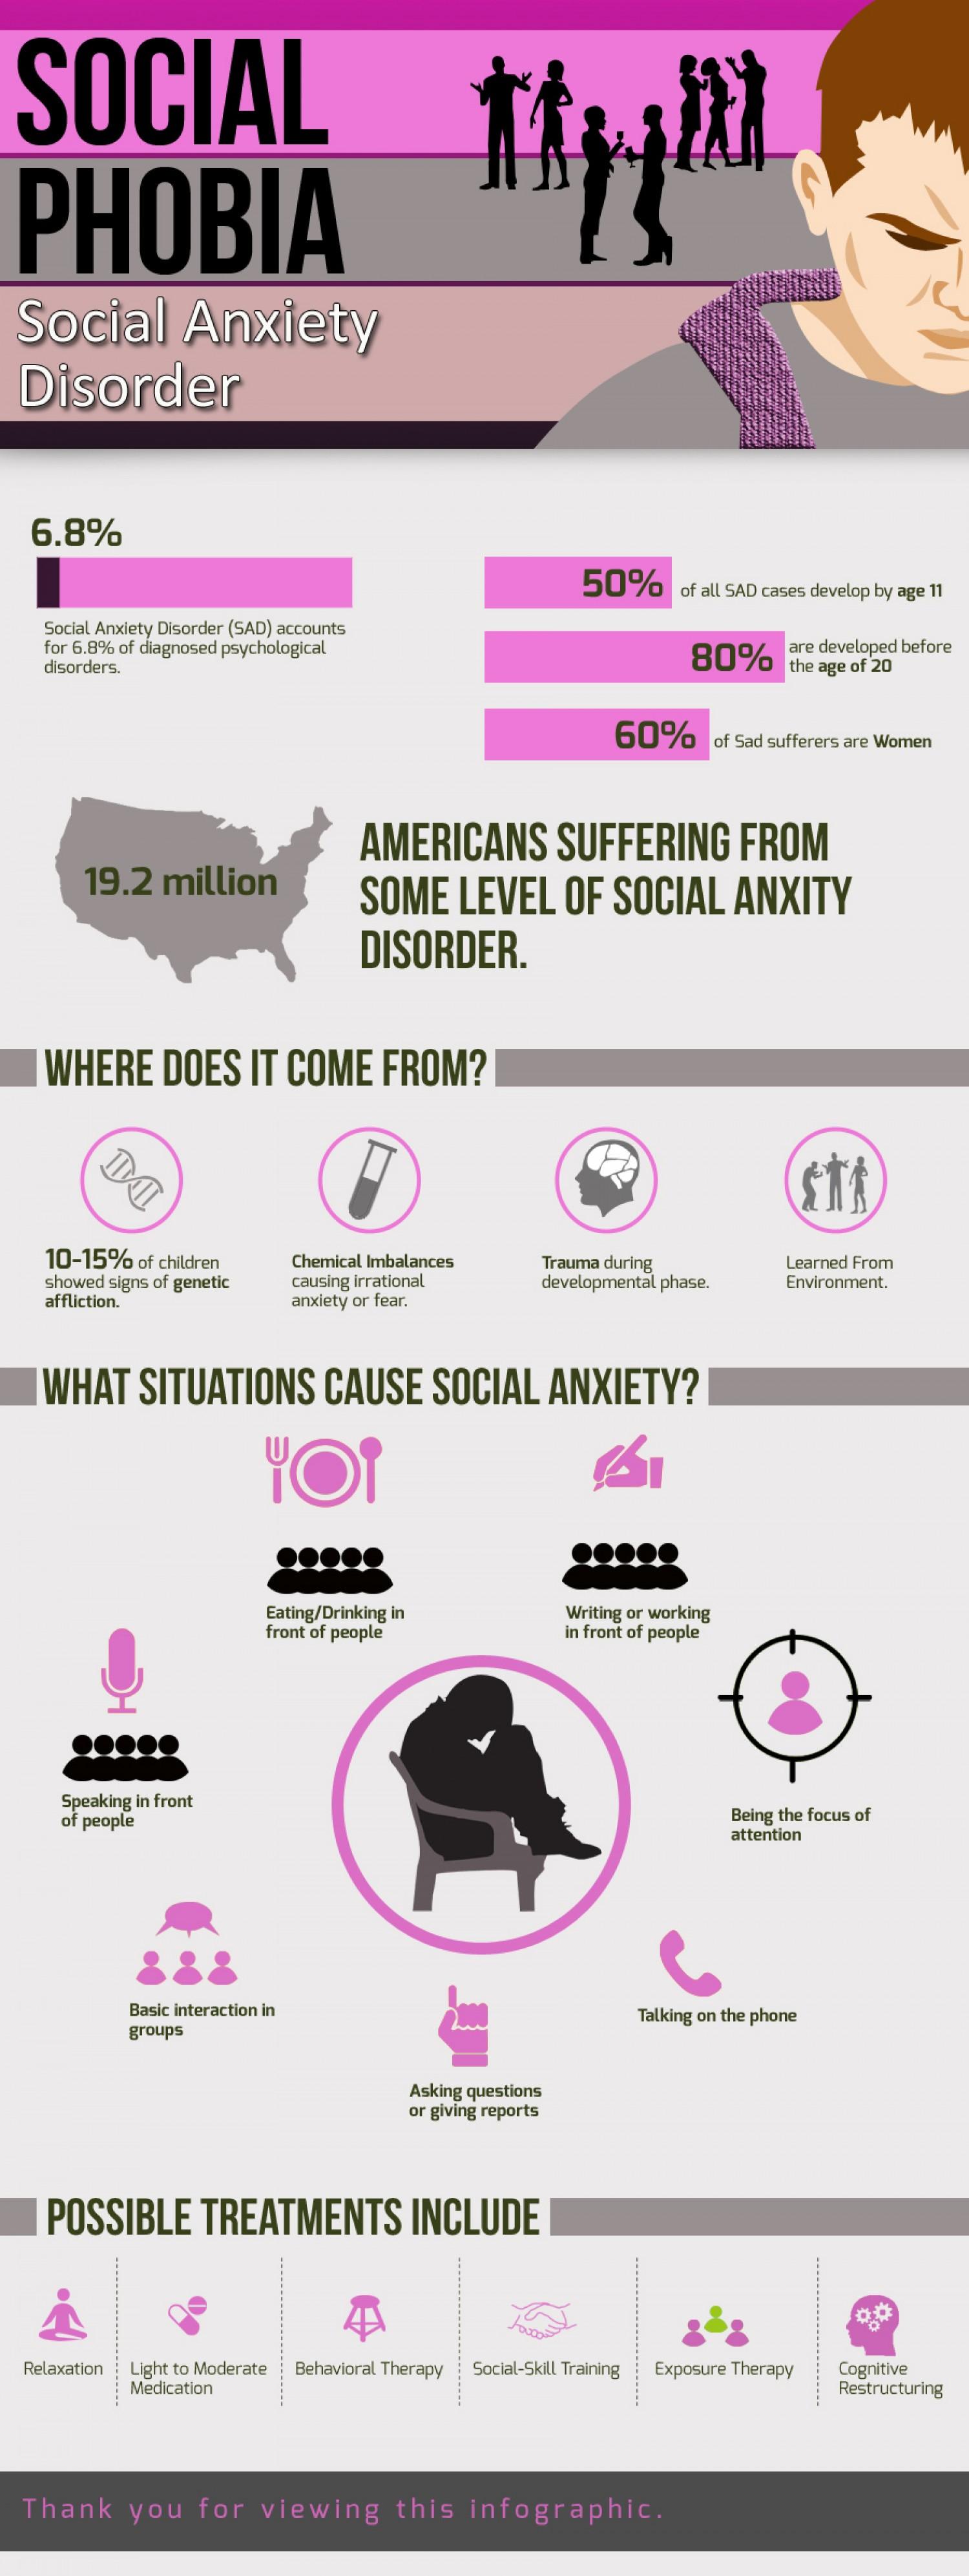 social-anxiety_528daa40c1244_w1500